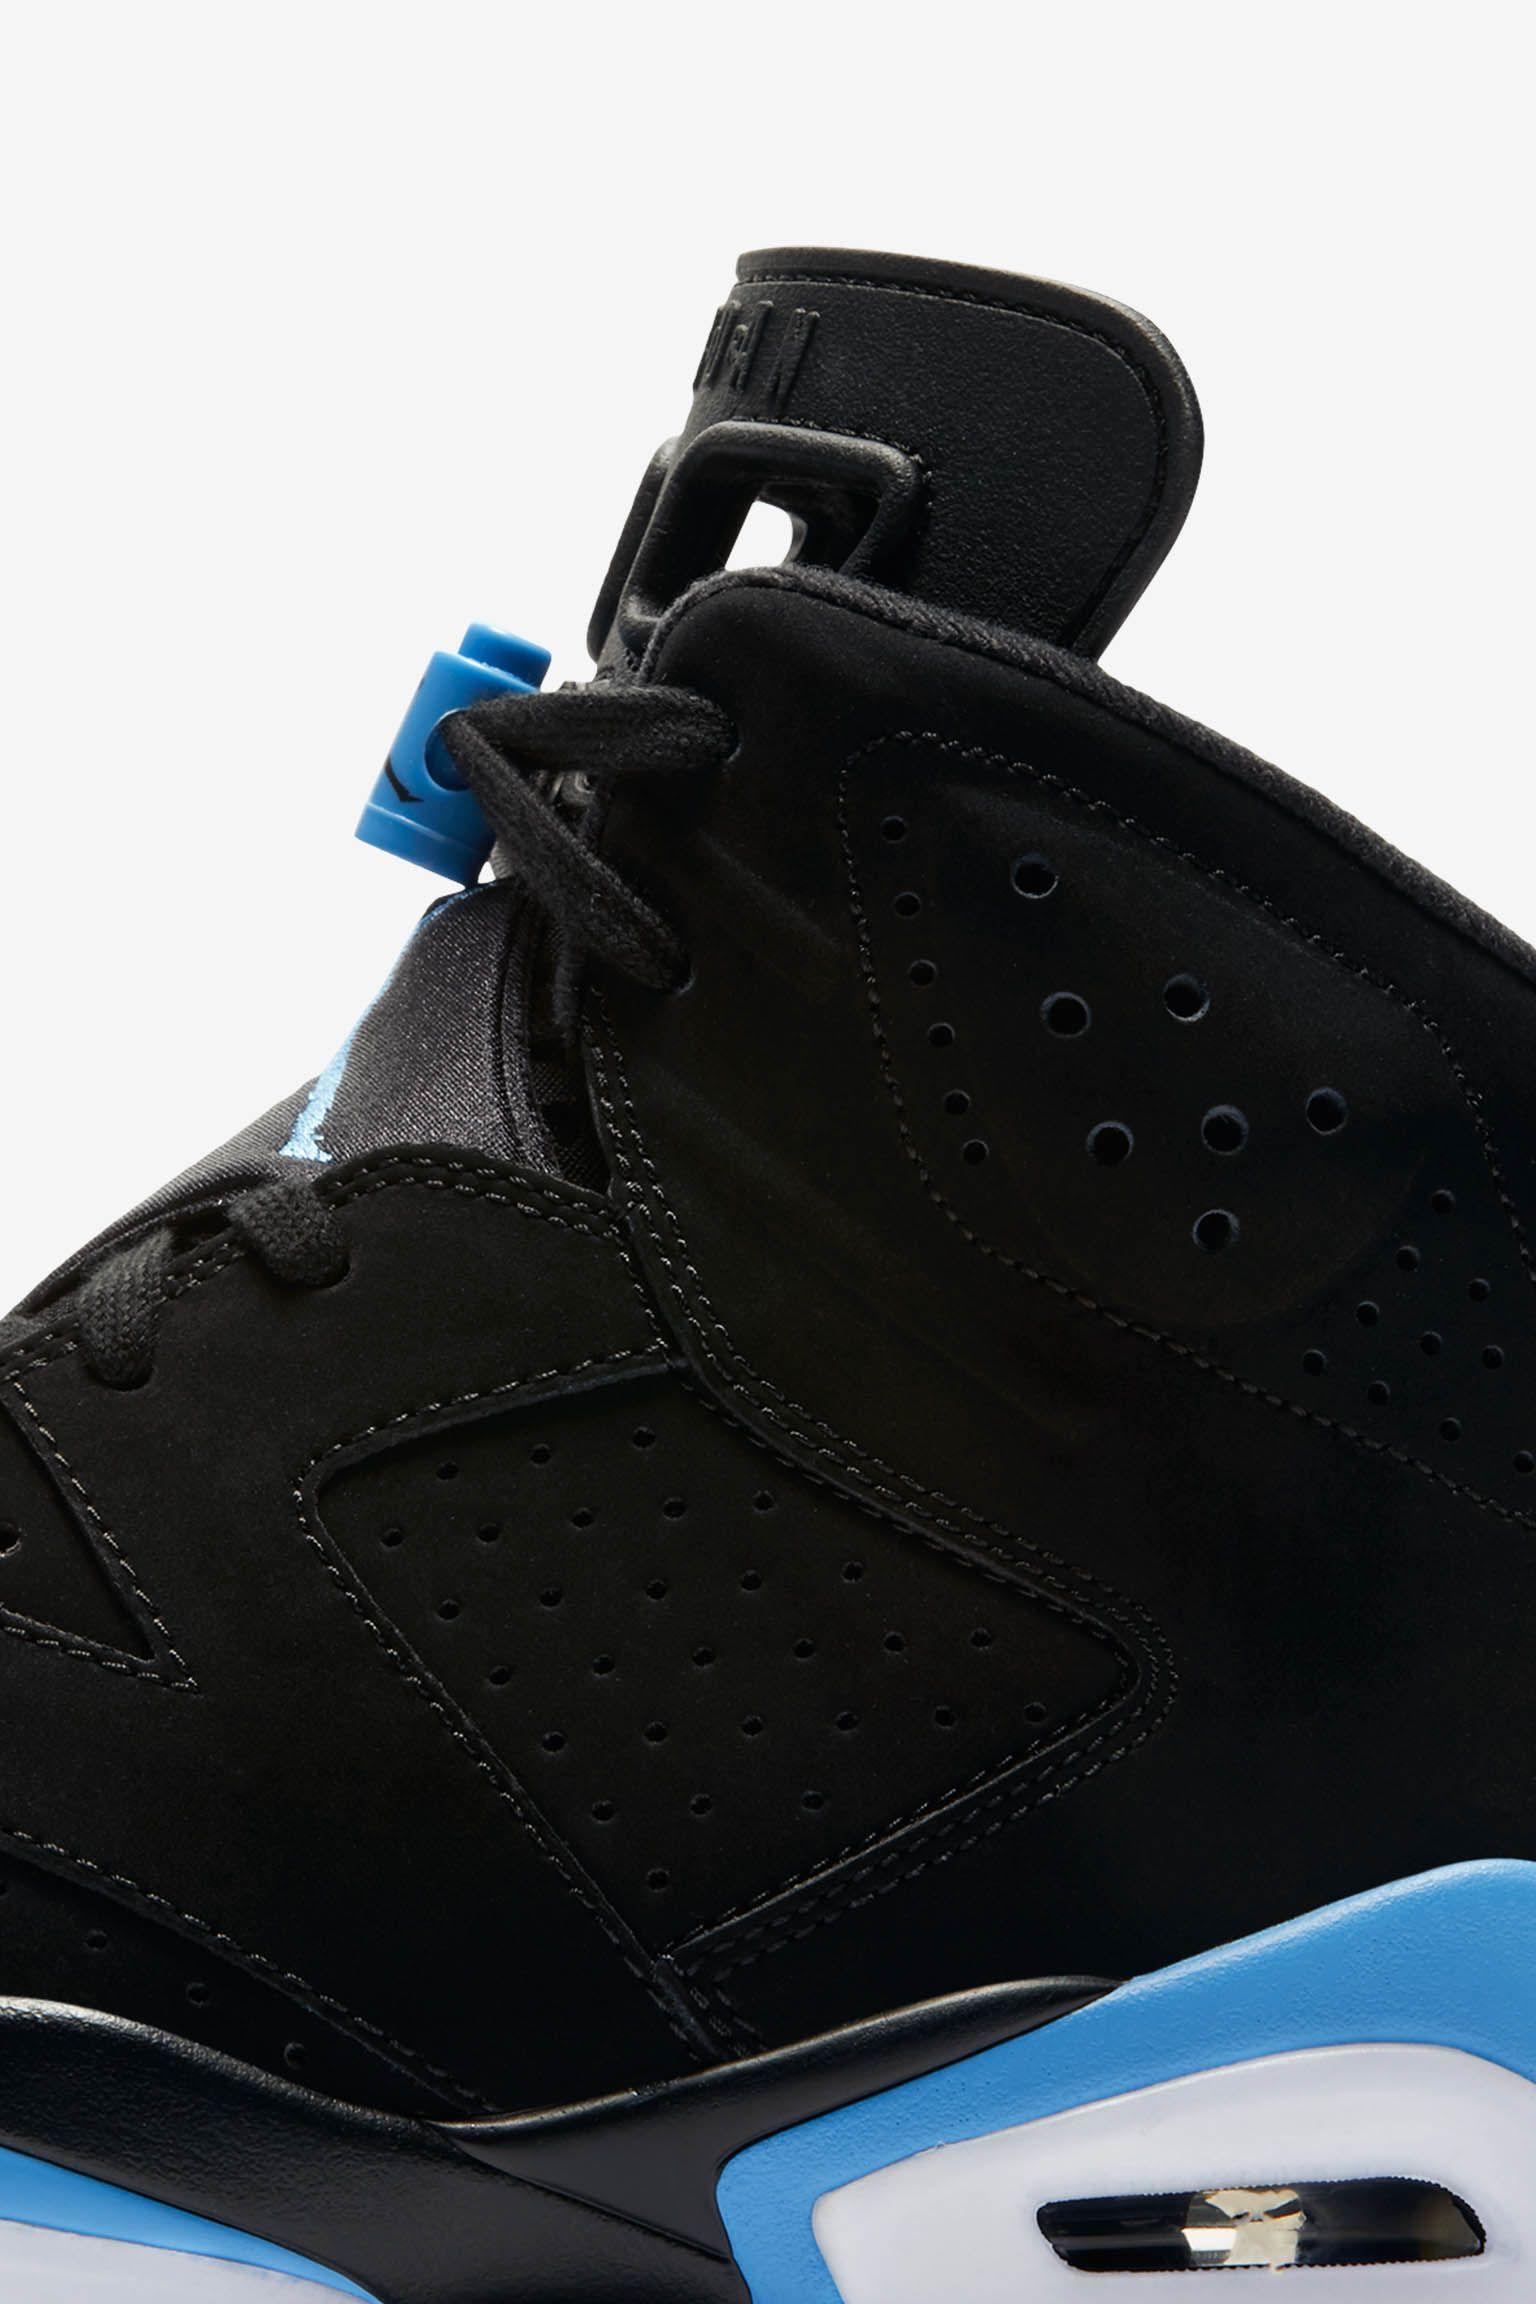 Air Jordan 6 'Black & University Blue' Release Date